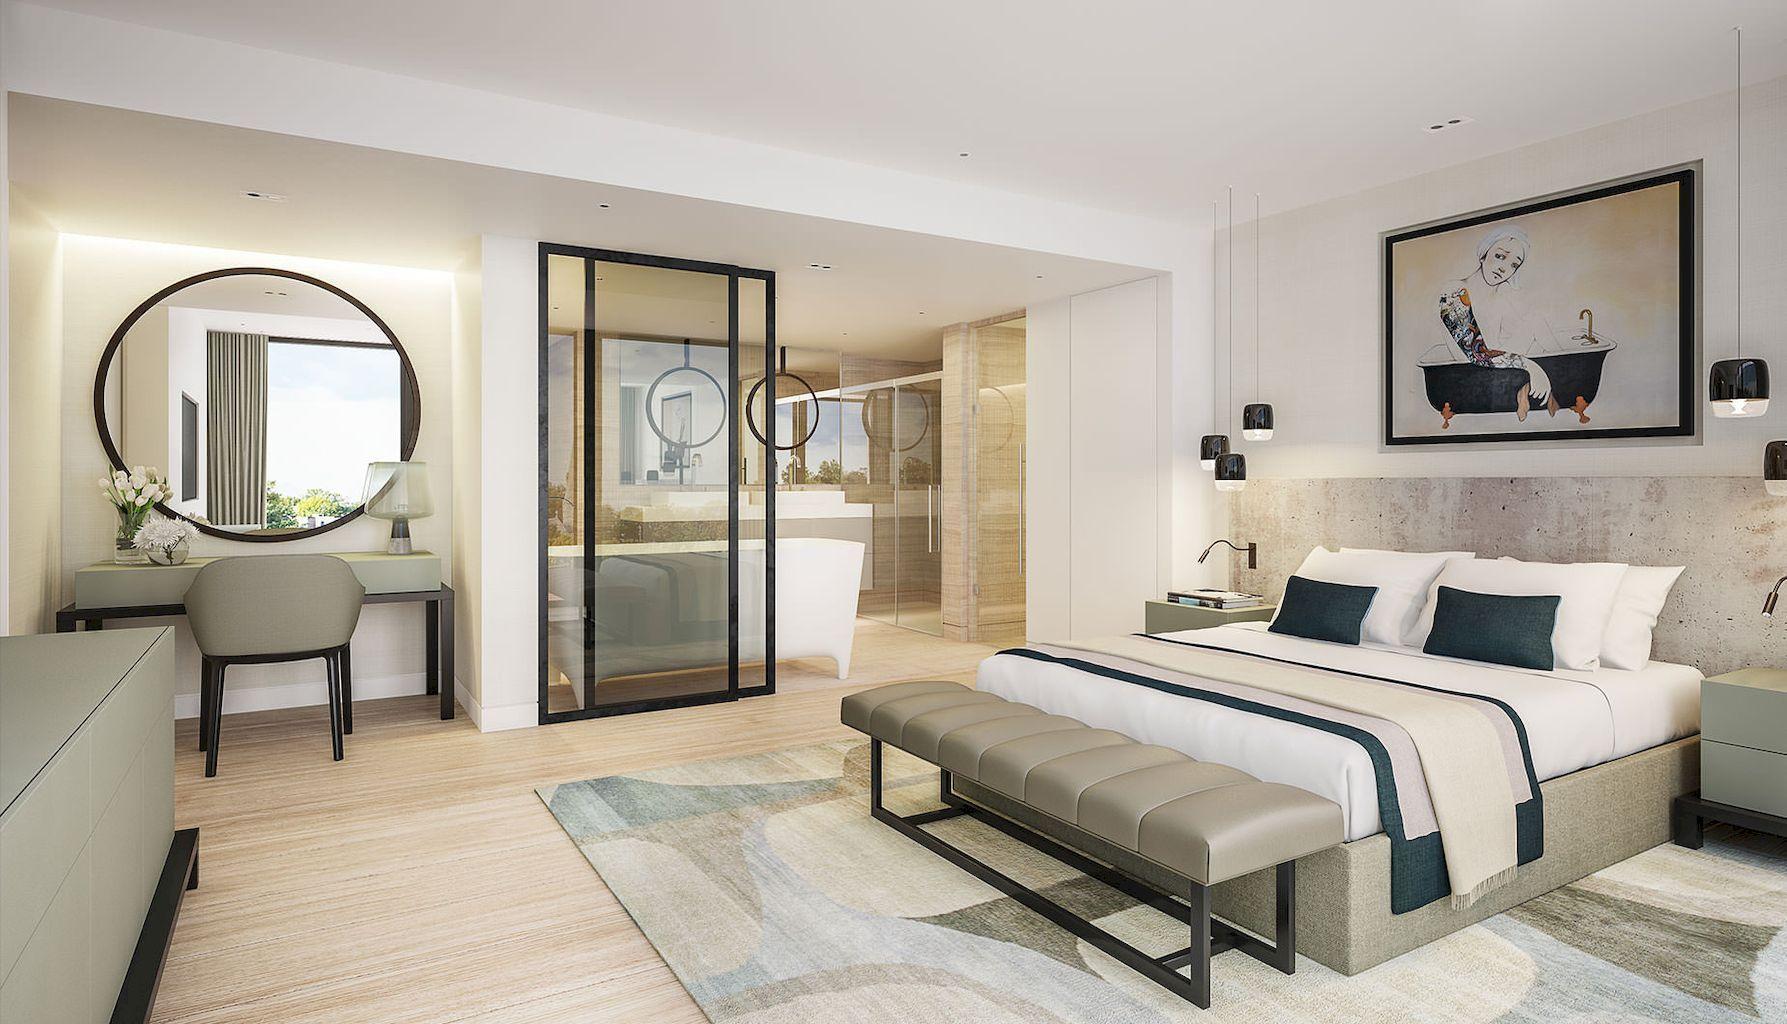 Luxuryensuitedesigns Luxury Master Bedroom Suite Modern Master Bedroom Bedroom Layouts